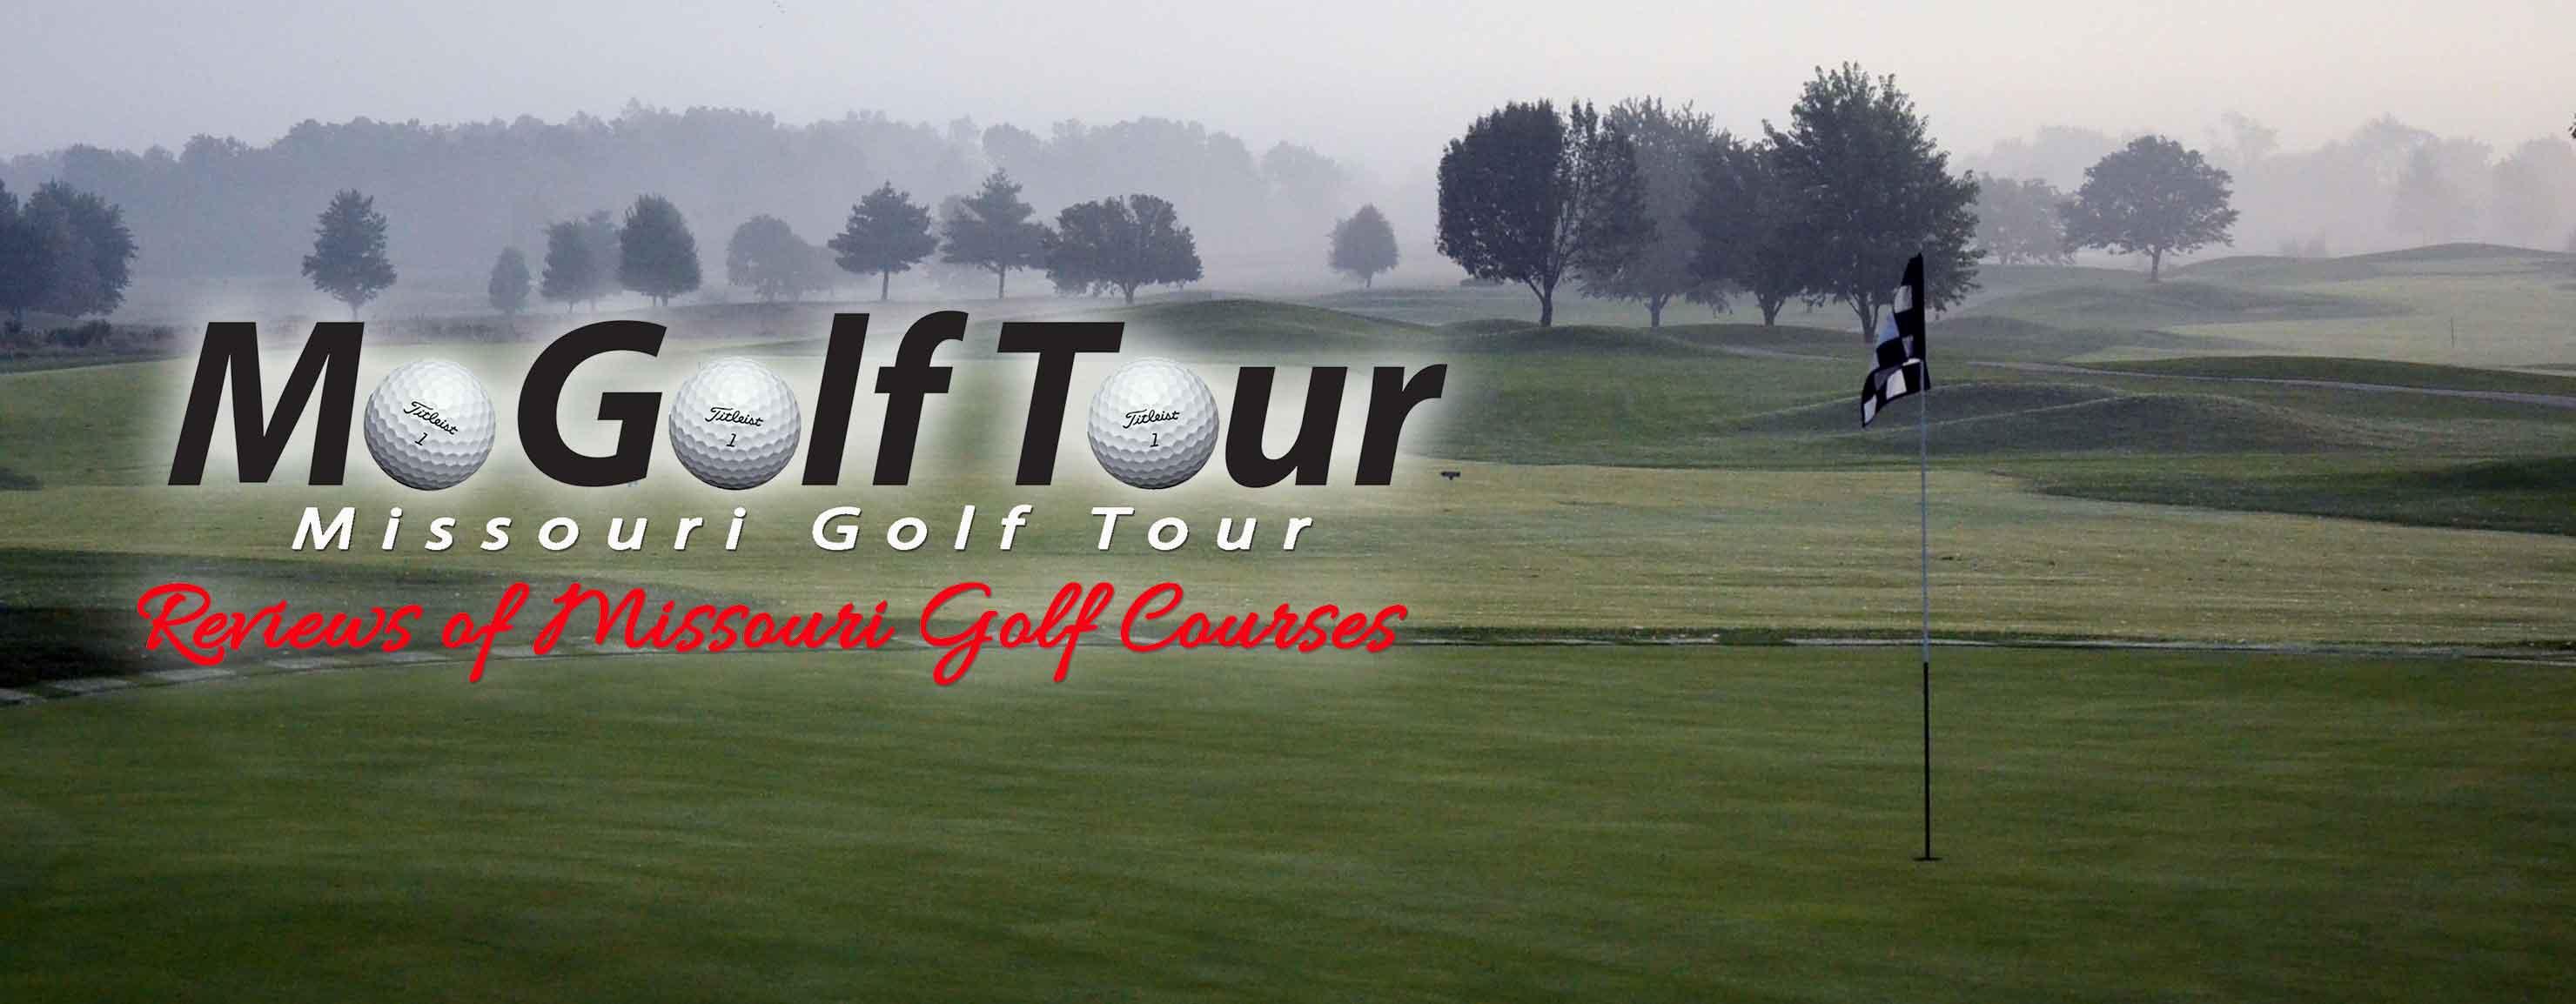 Overall Best Missouri Golf Course